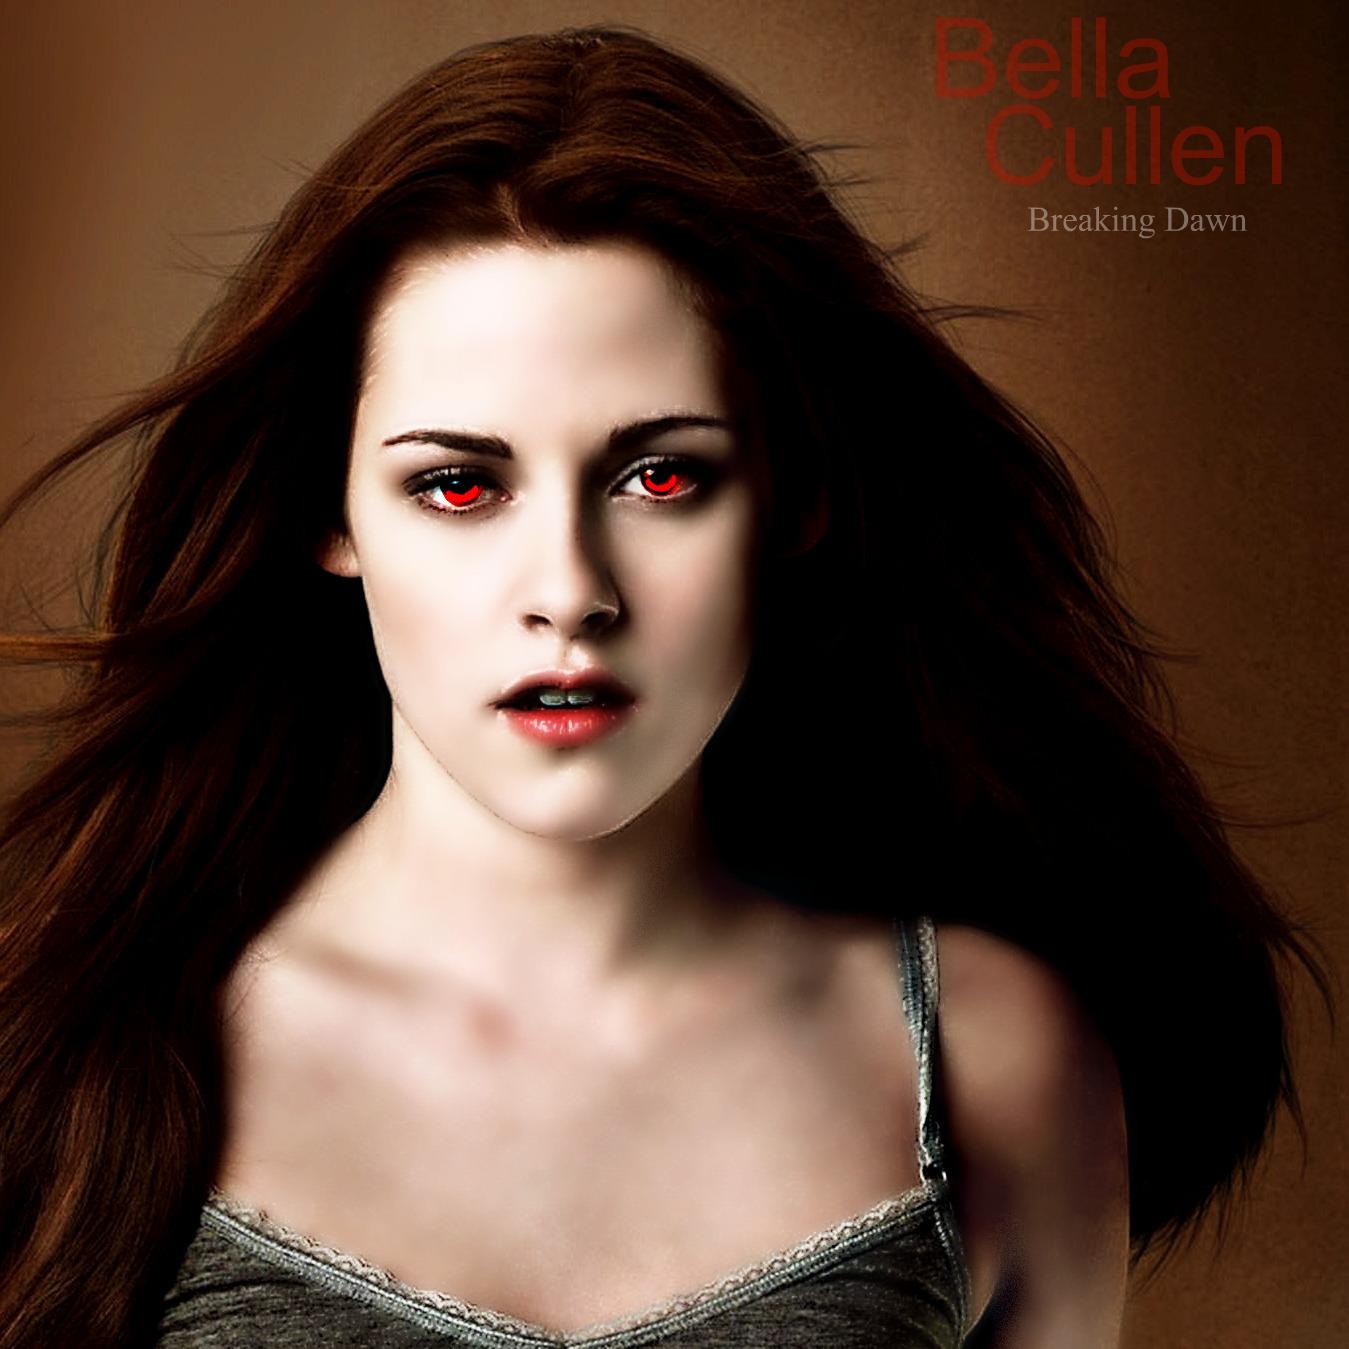 vampire bella twilight series photo 9443714 fanpop